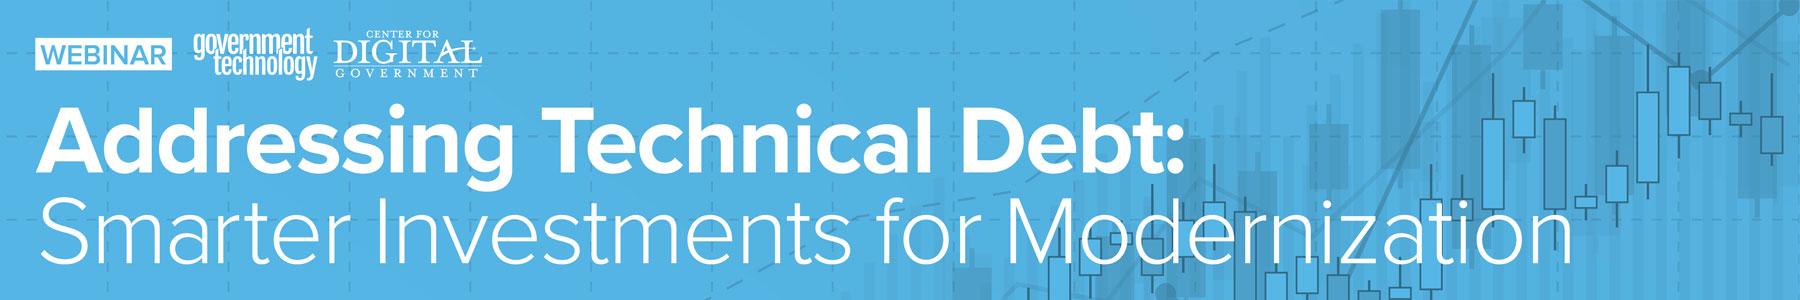 Addressing Technical Debt: Smarter Investments for Modernization